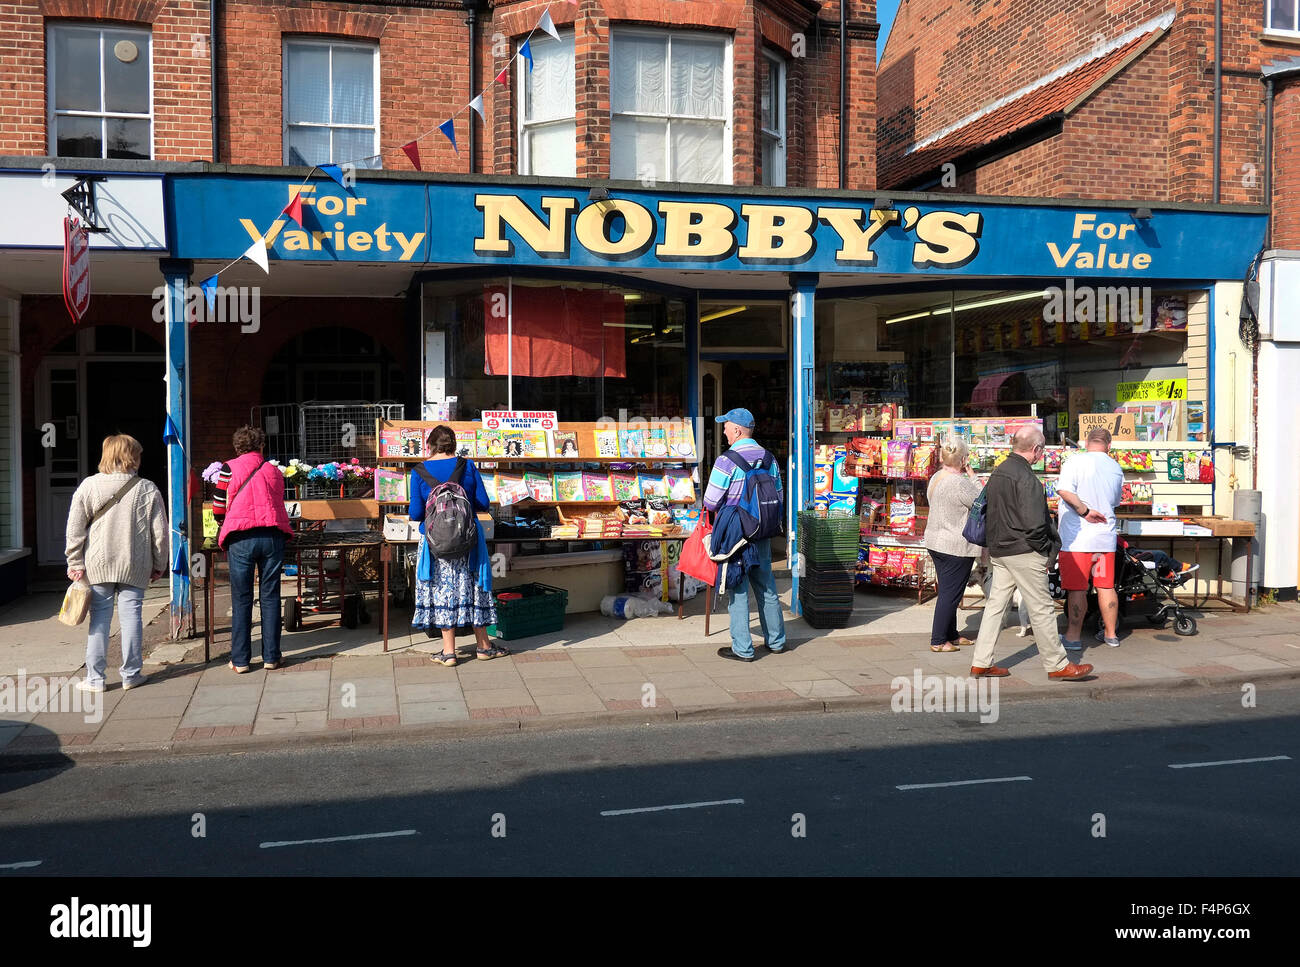 Nobbyu0027s Discount Store, Sheringham, North Norfolk, England   Stock Image